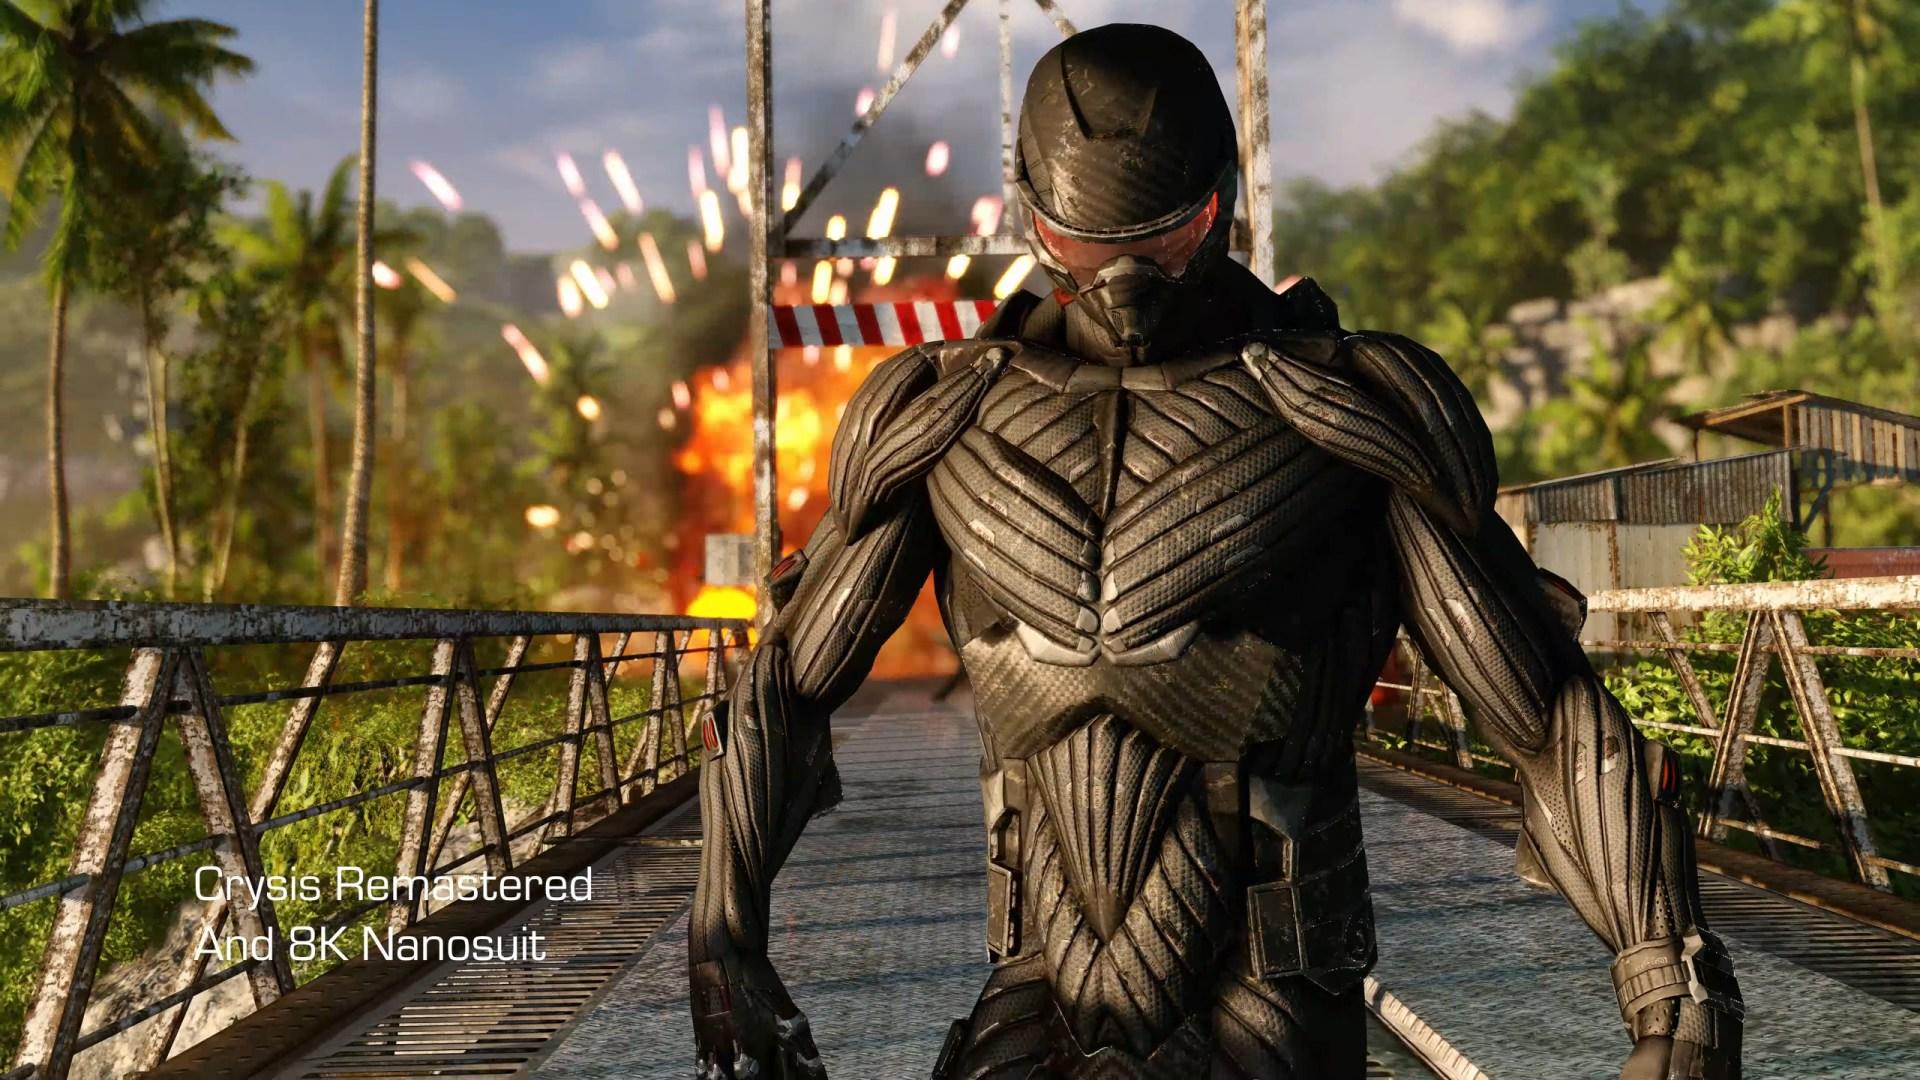 Trailer, Ego-Shooter, Crytek, Crysis, Crysis Remastered